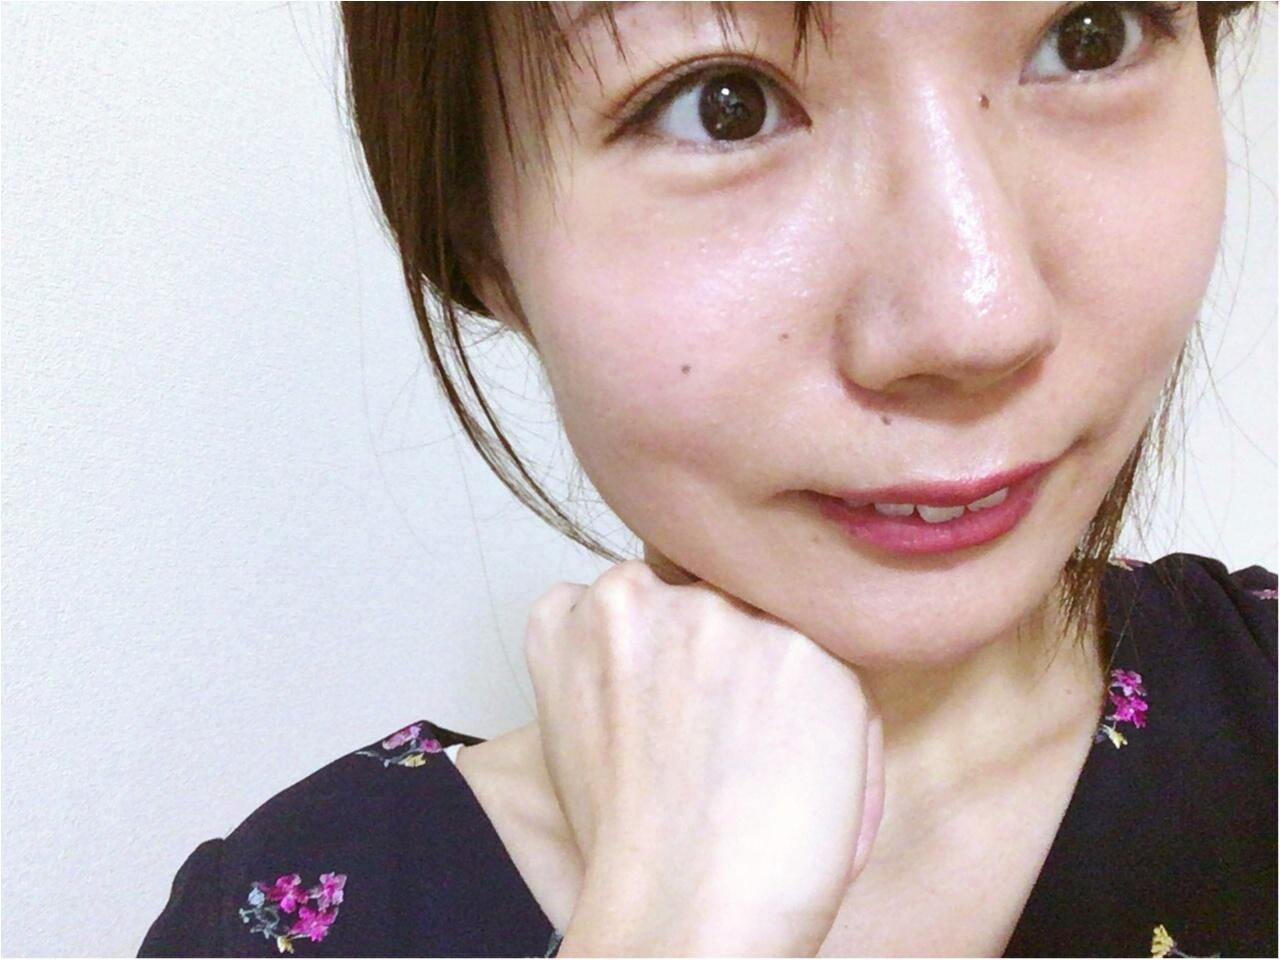 【SALE】プリプラ!《Honeys》可愛い♡流行り刺繍ブラウスと定番白カーディガンを♡_5